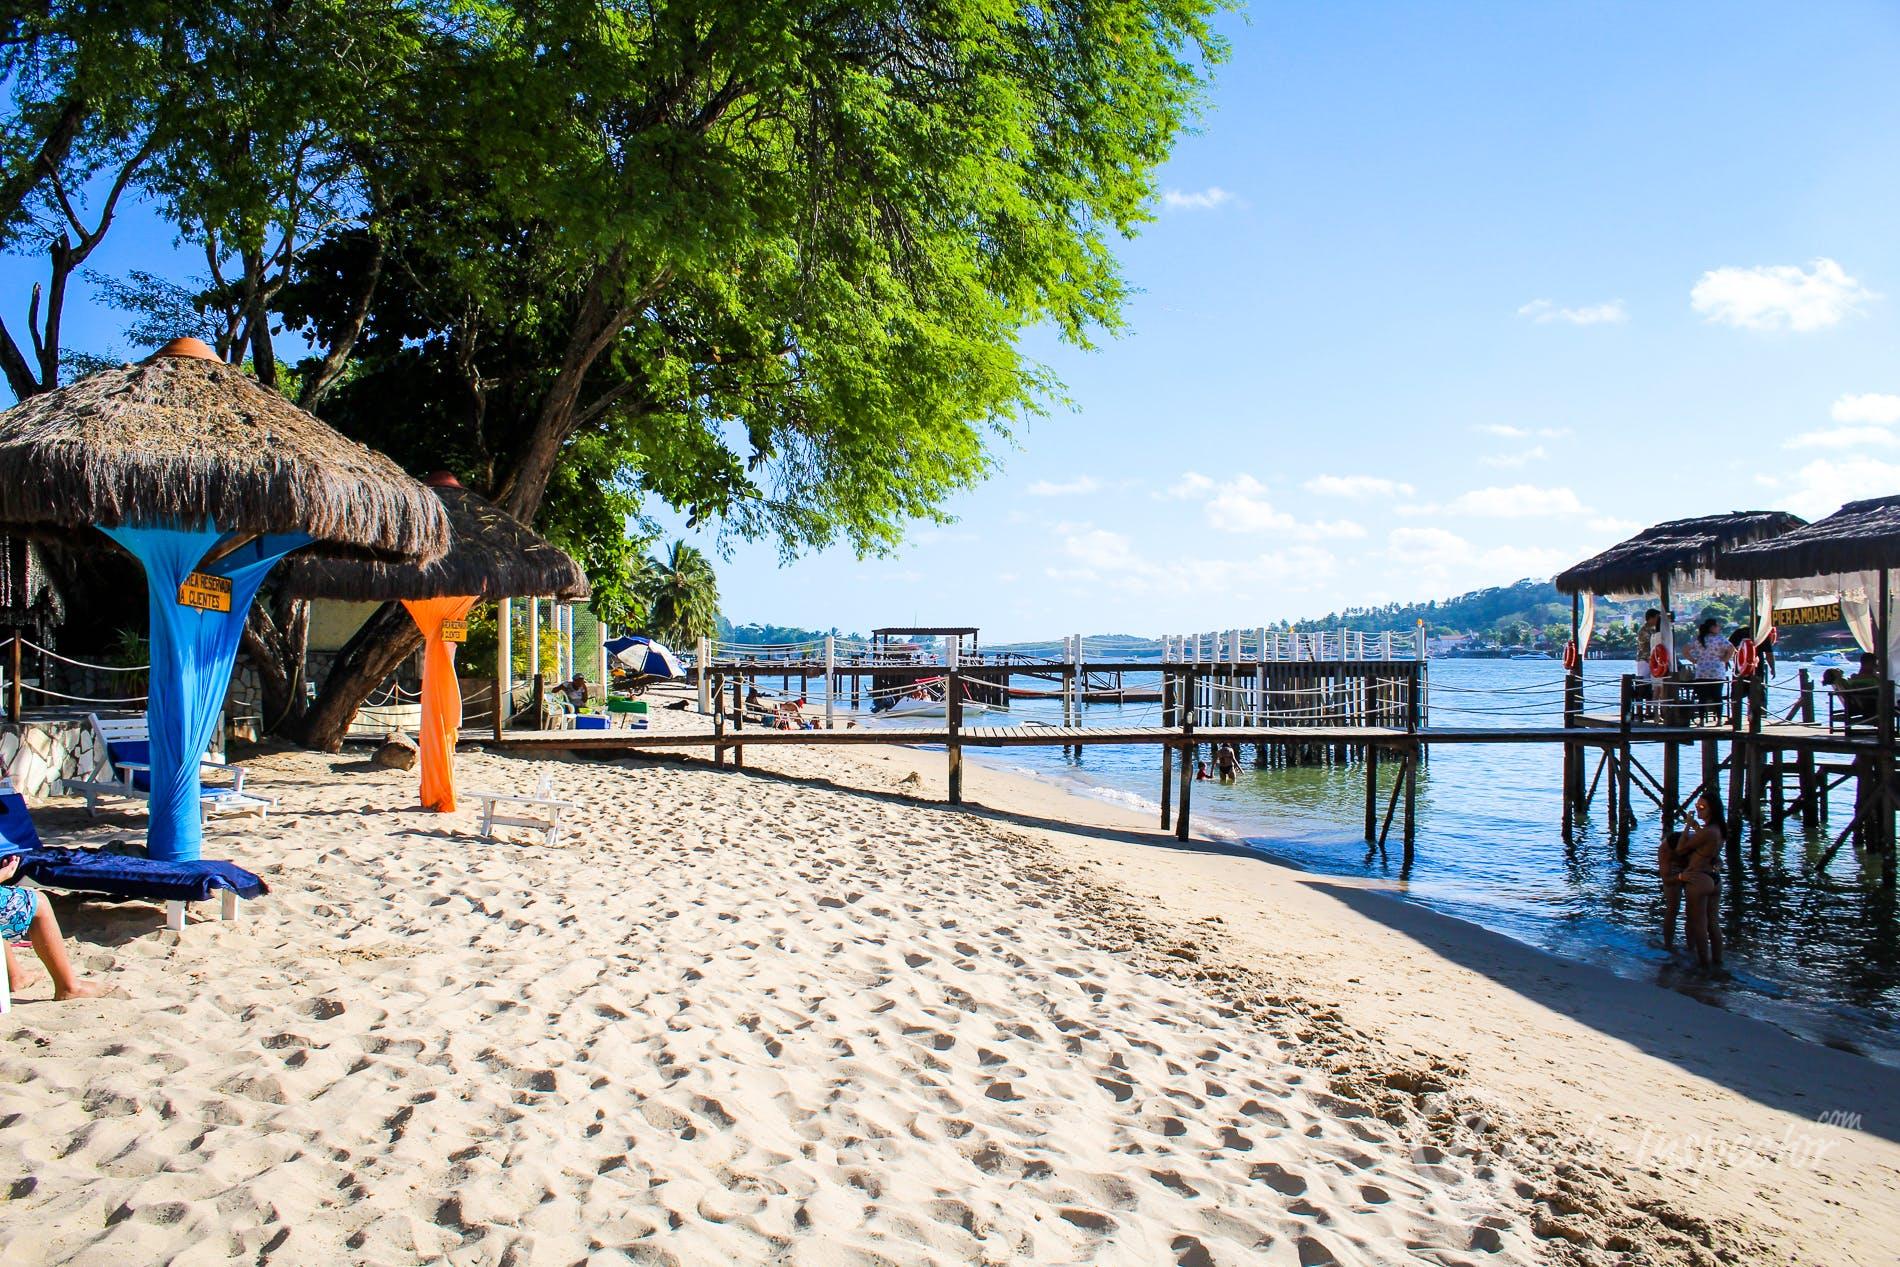 Beach Praia de Pontal de Maria Farinha, Pernambuco, Brazil